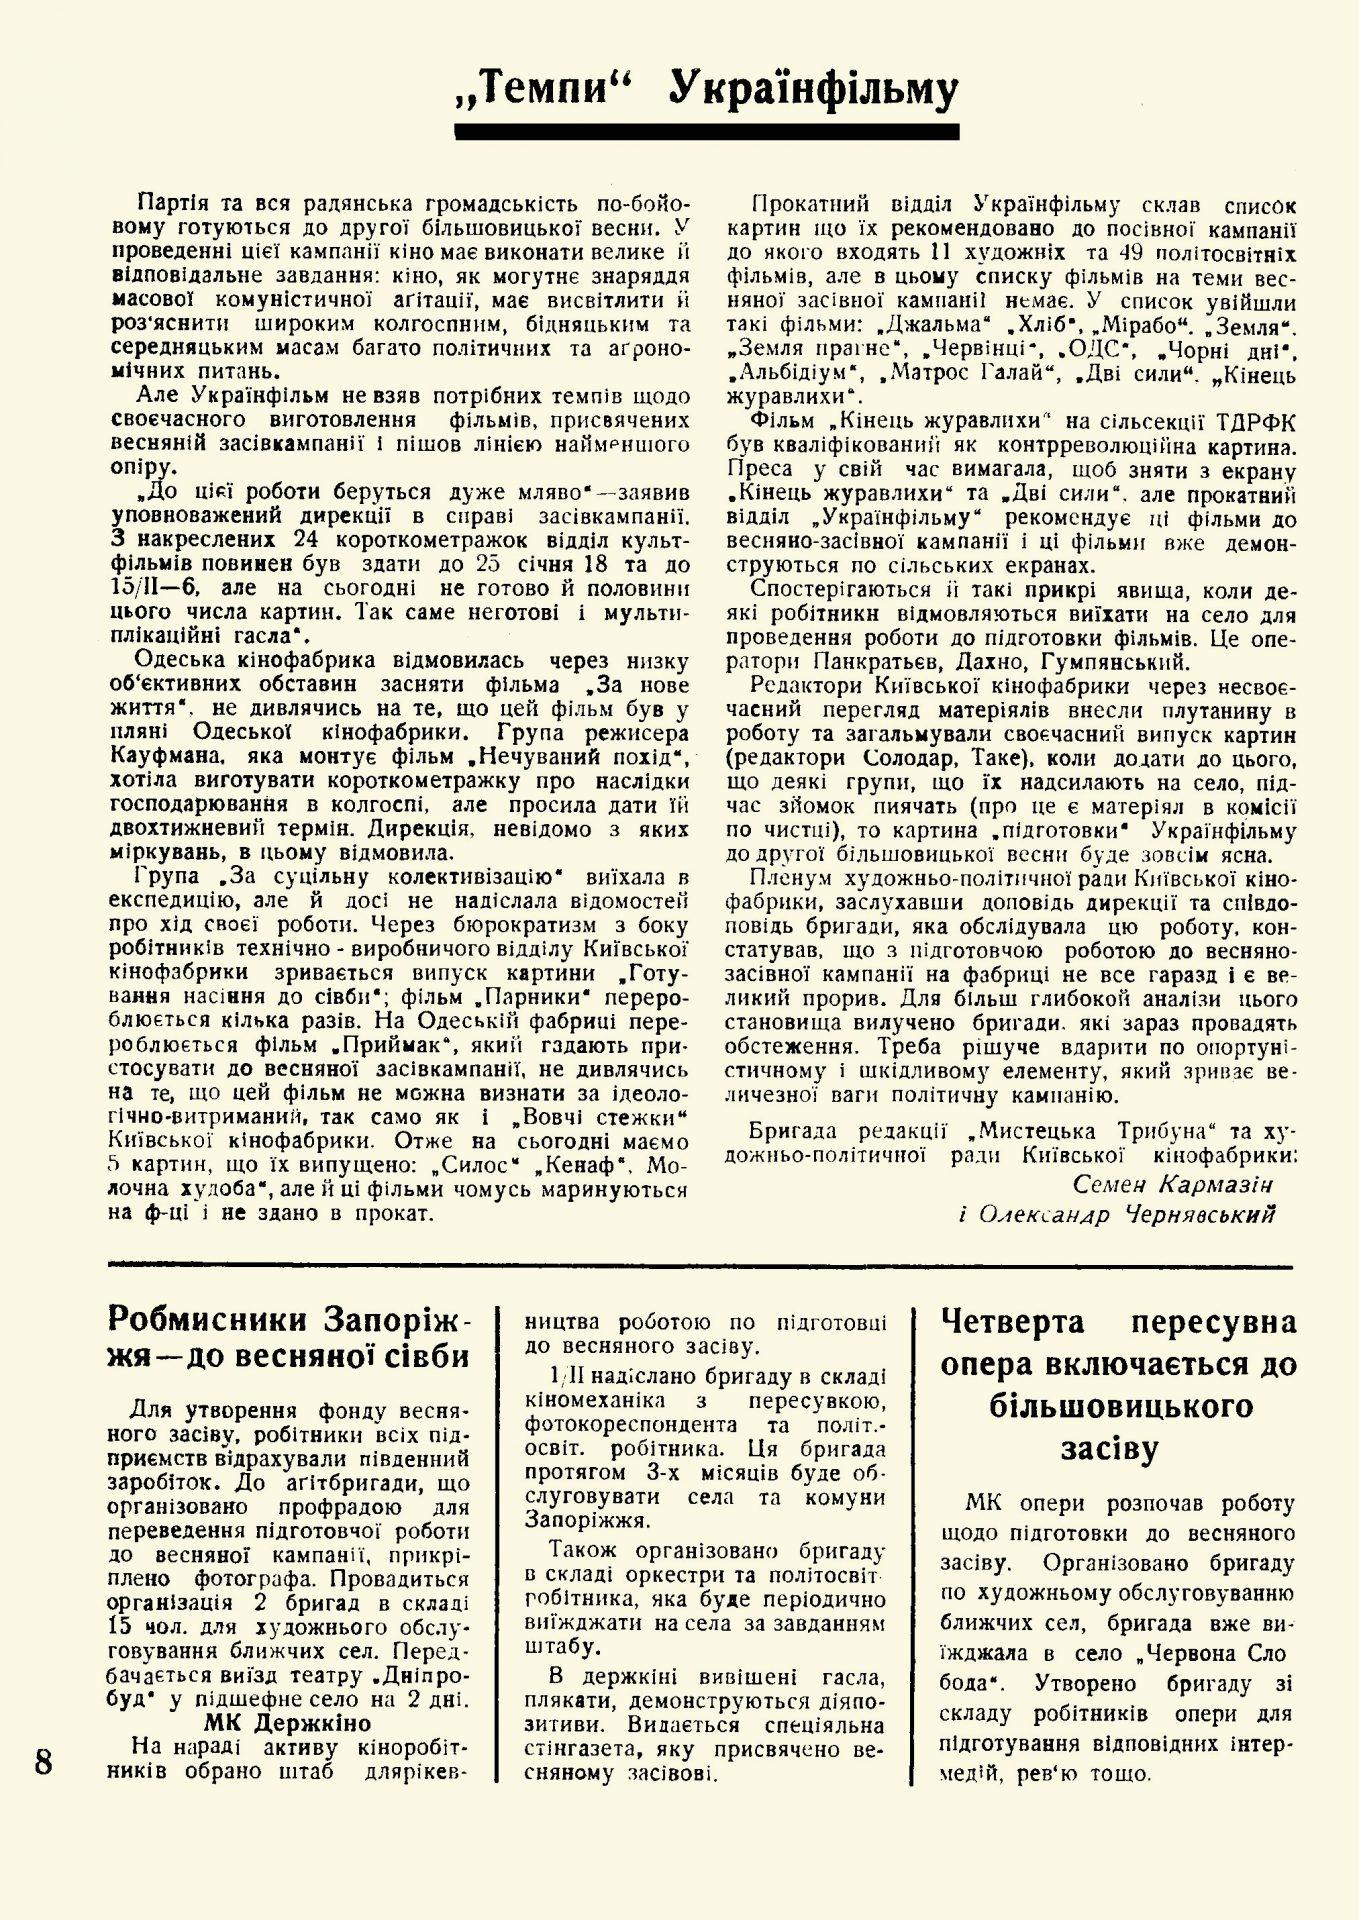 Мистецька трибуна_1931_№ 4